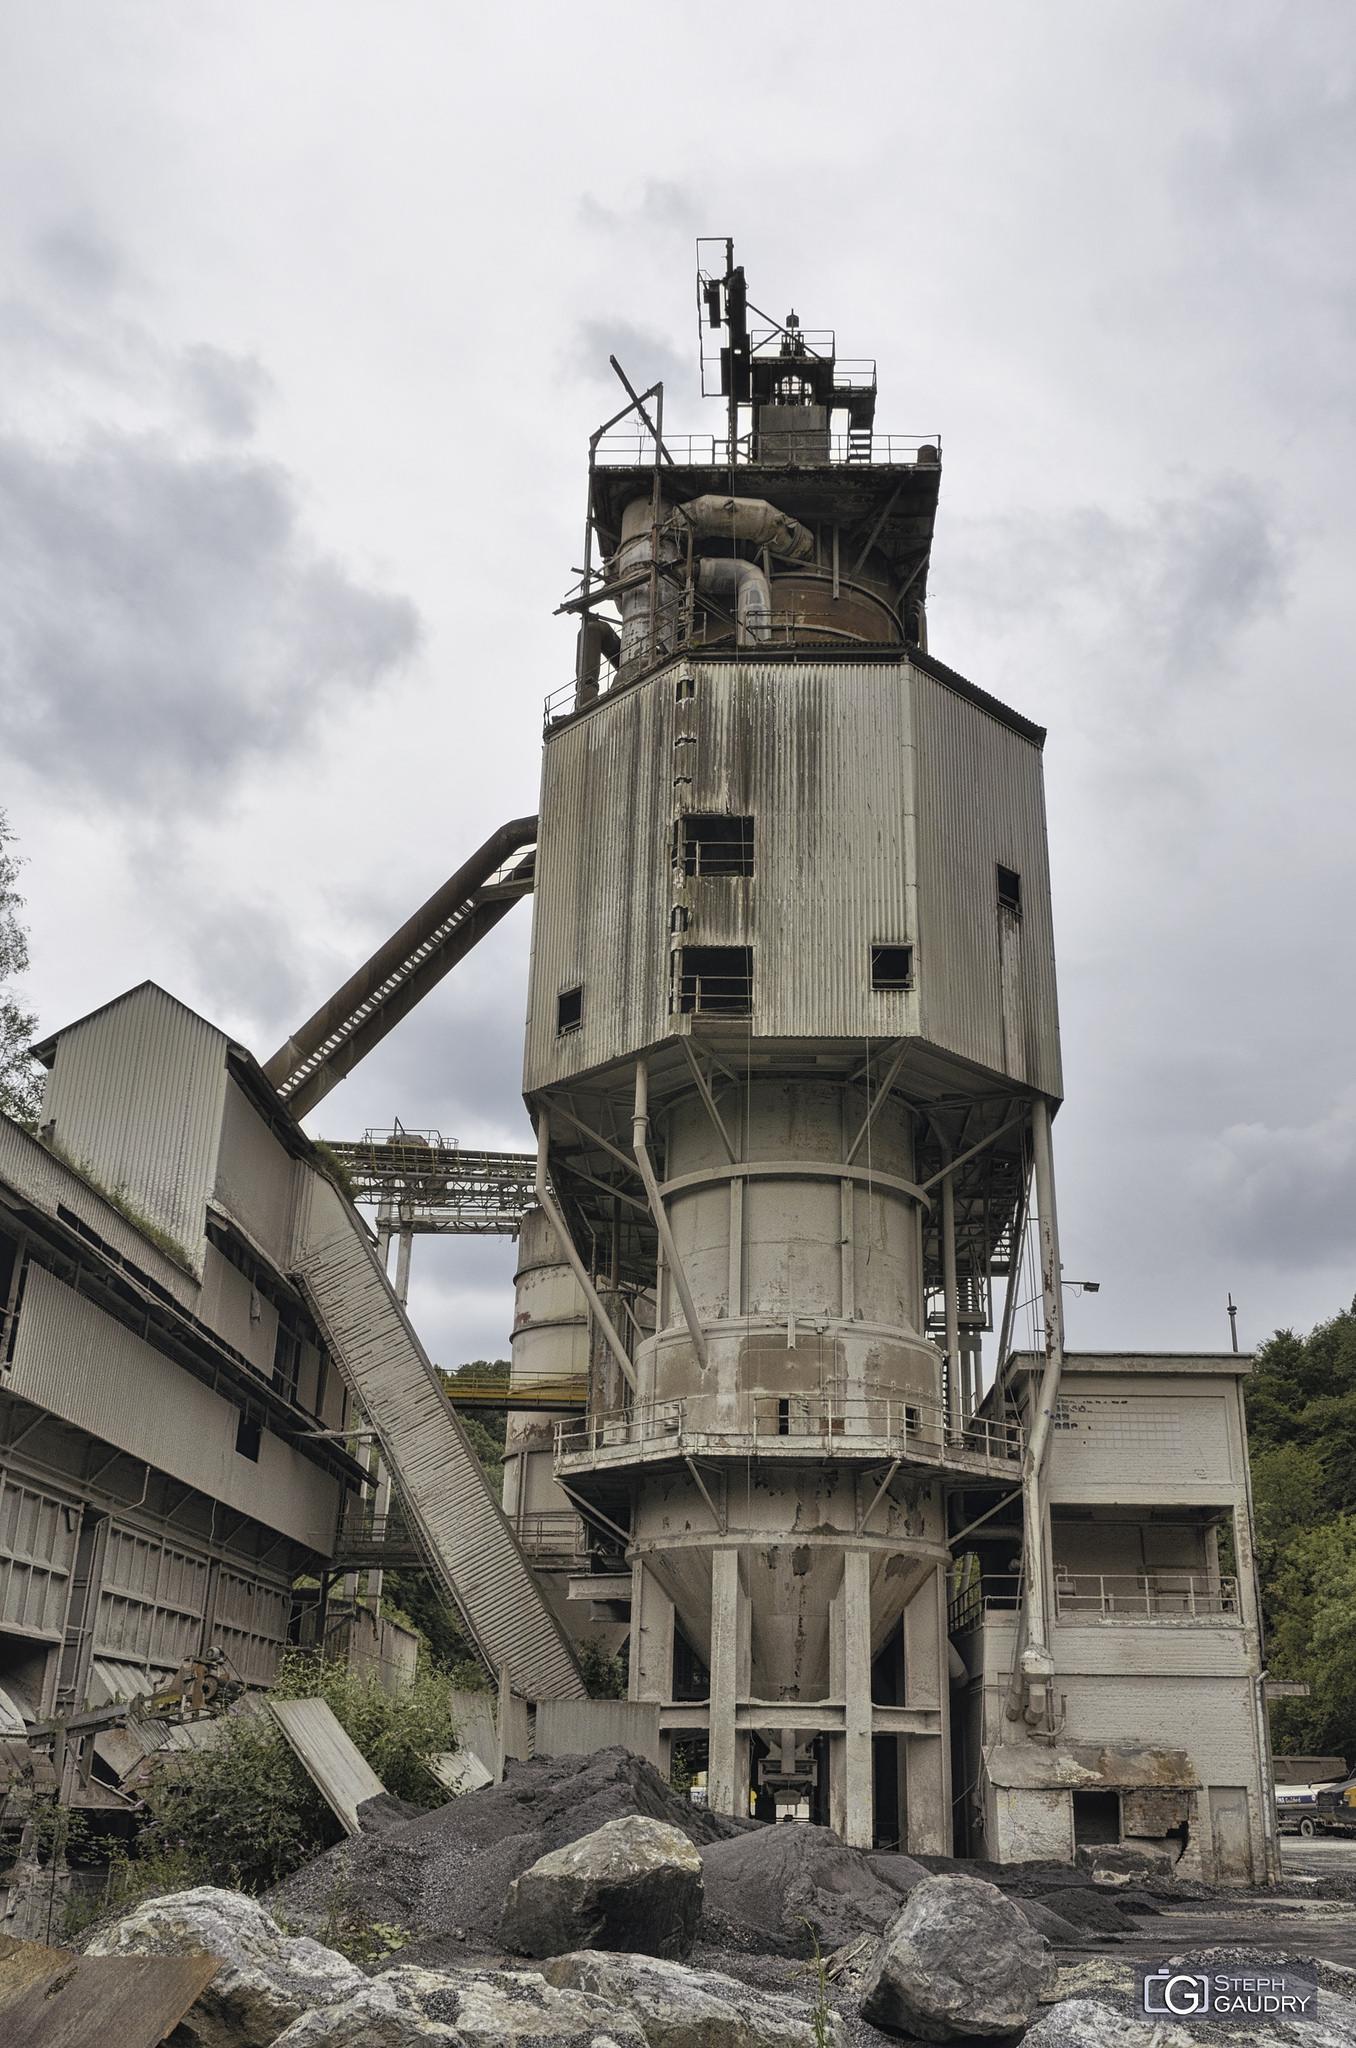 La tour du Bay-Bonnet [Klik om de diavoorstelling te starten]